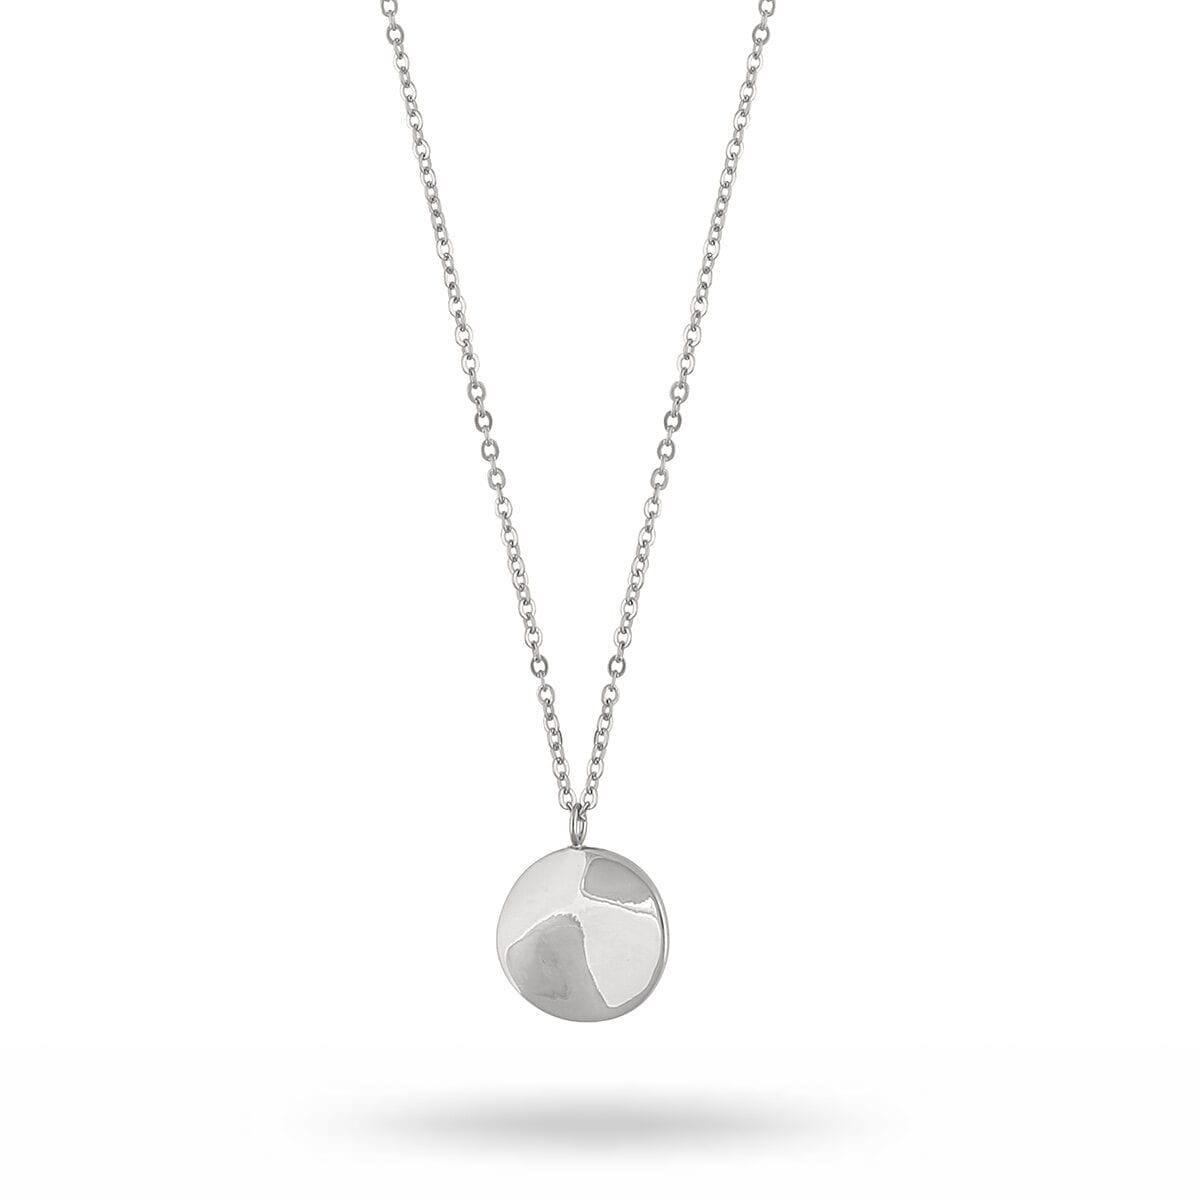 1006-2201256-1-Phoebe-small-pendant-neck-42-plain-s